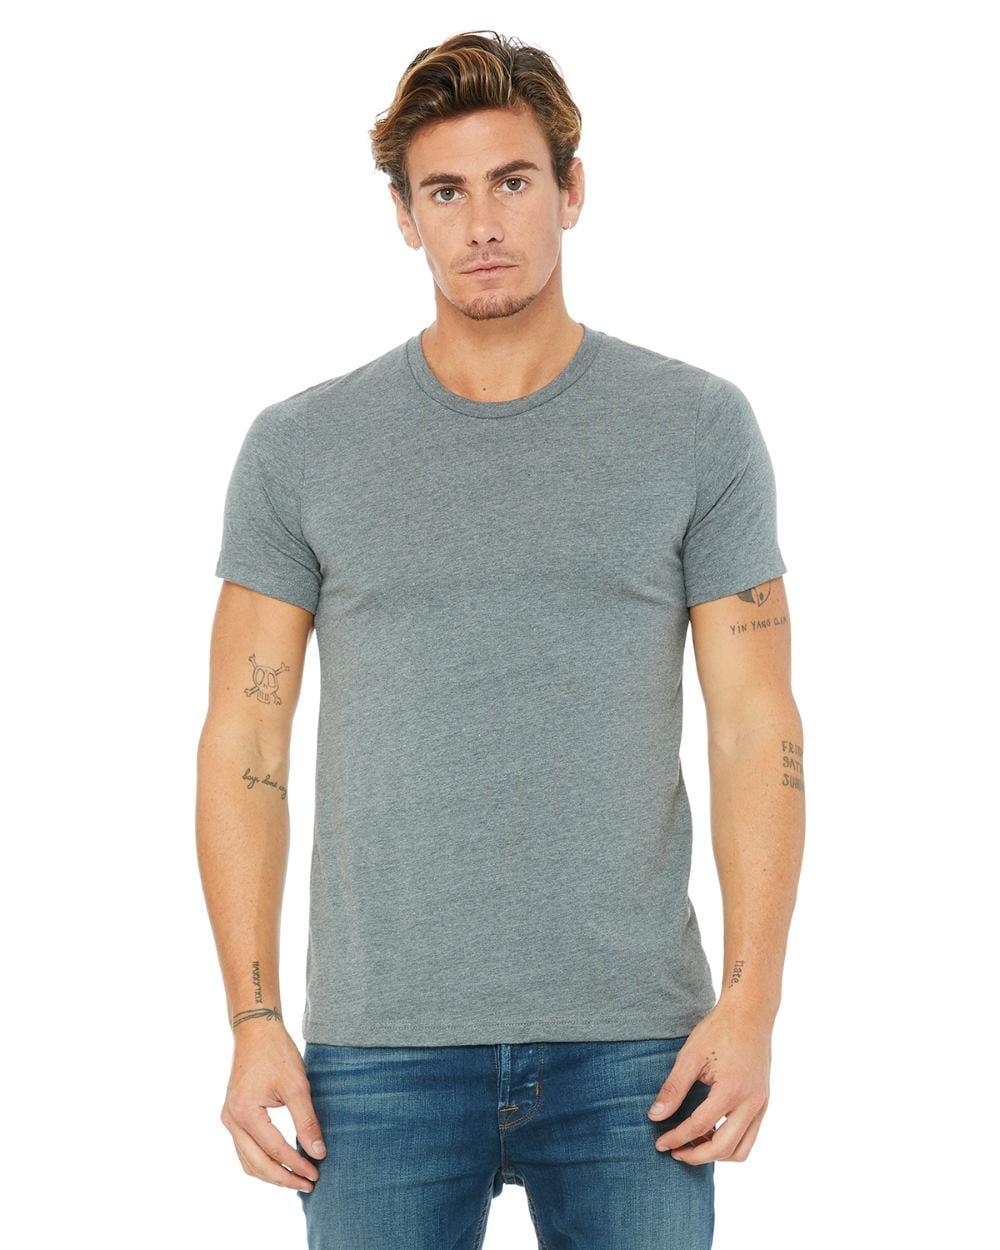 Bella and Canvas Unisex Jersey Short Sleeve Soft T Shirts 3001C 3001CVC